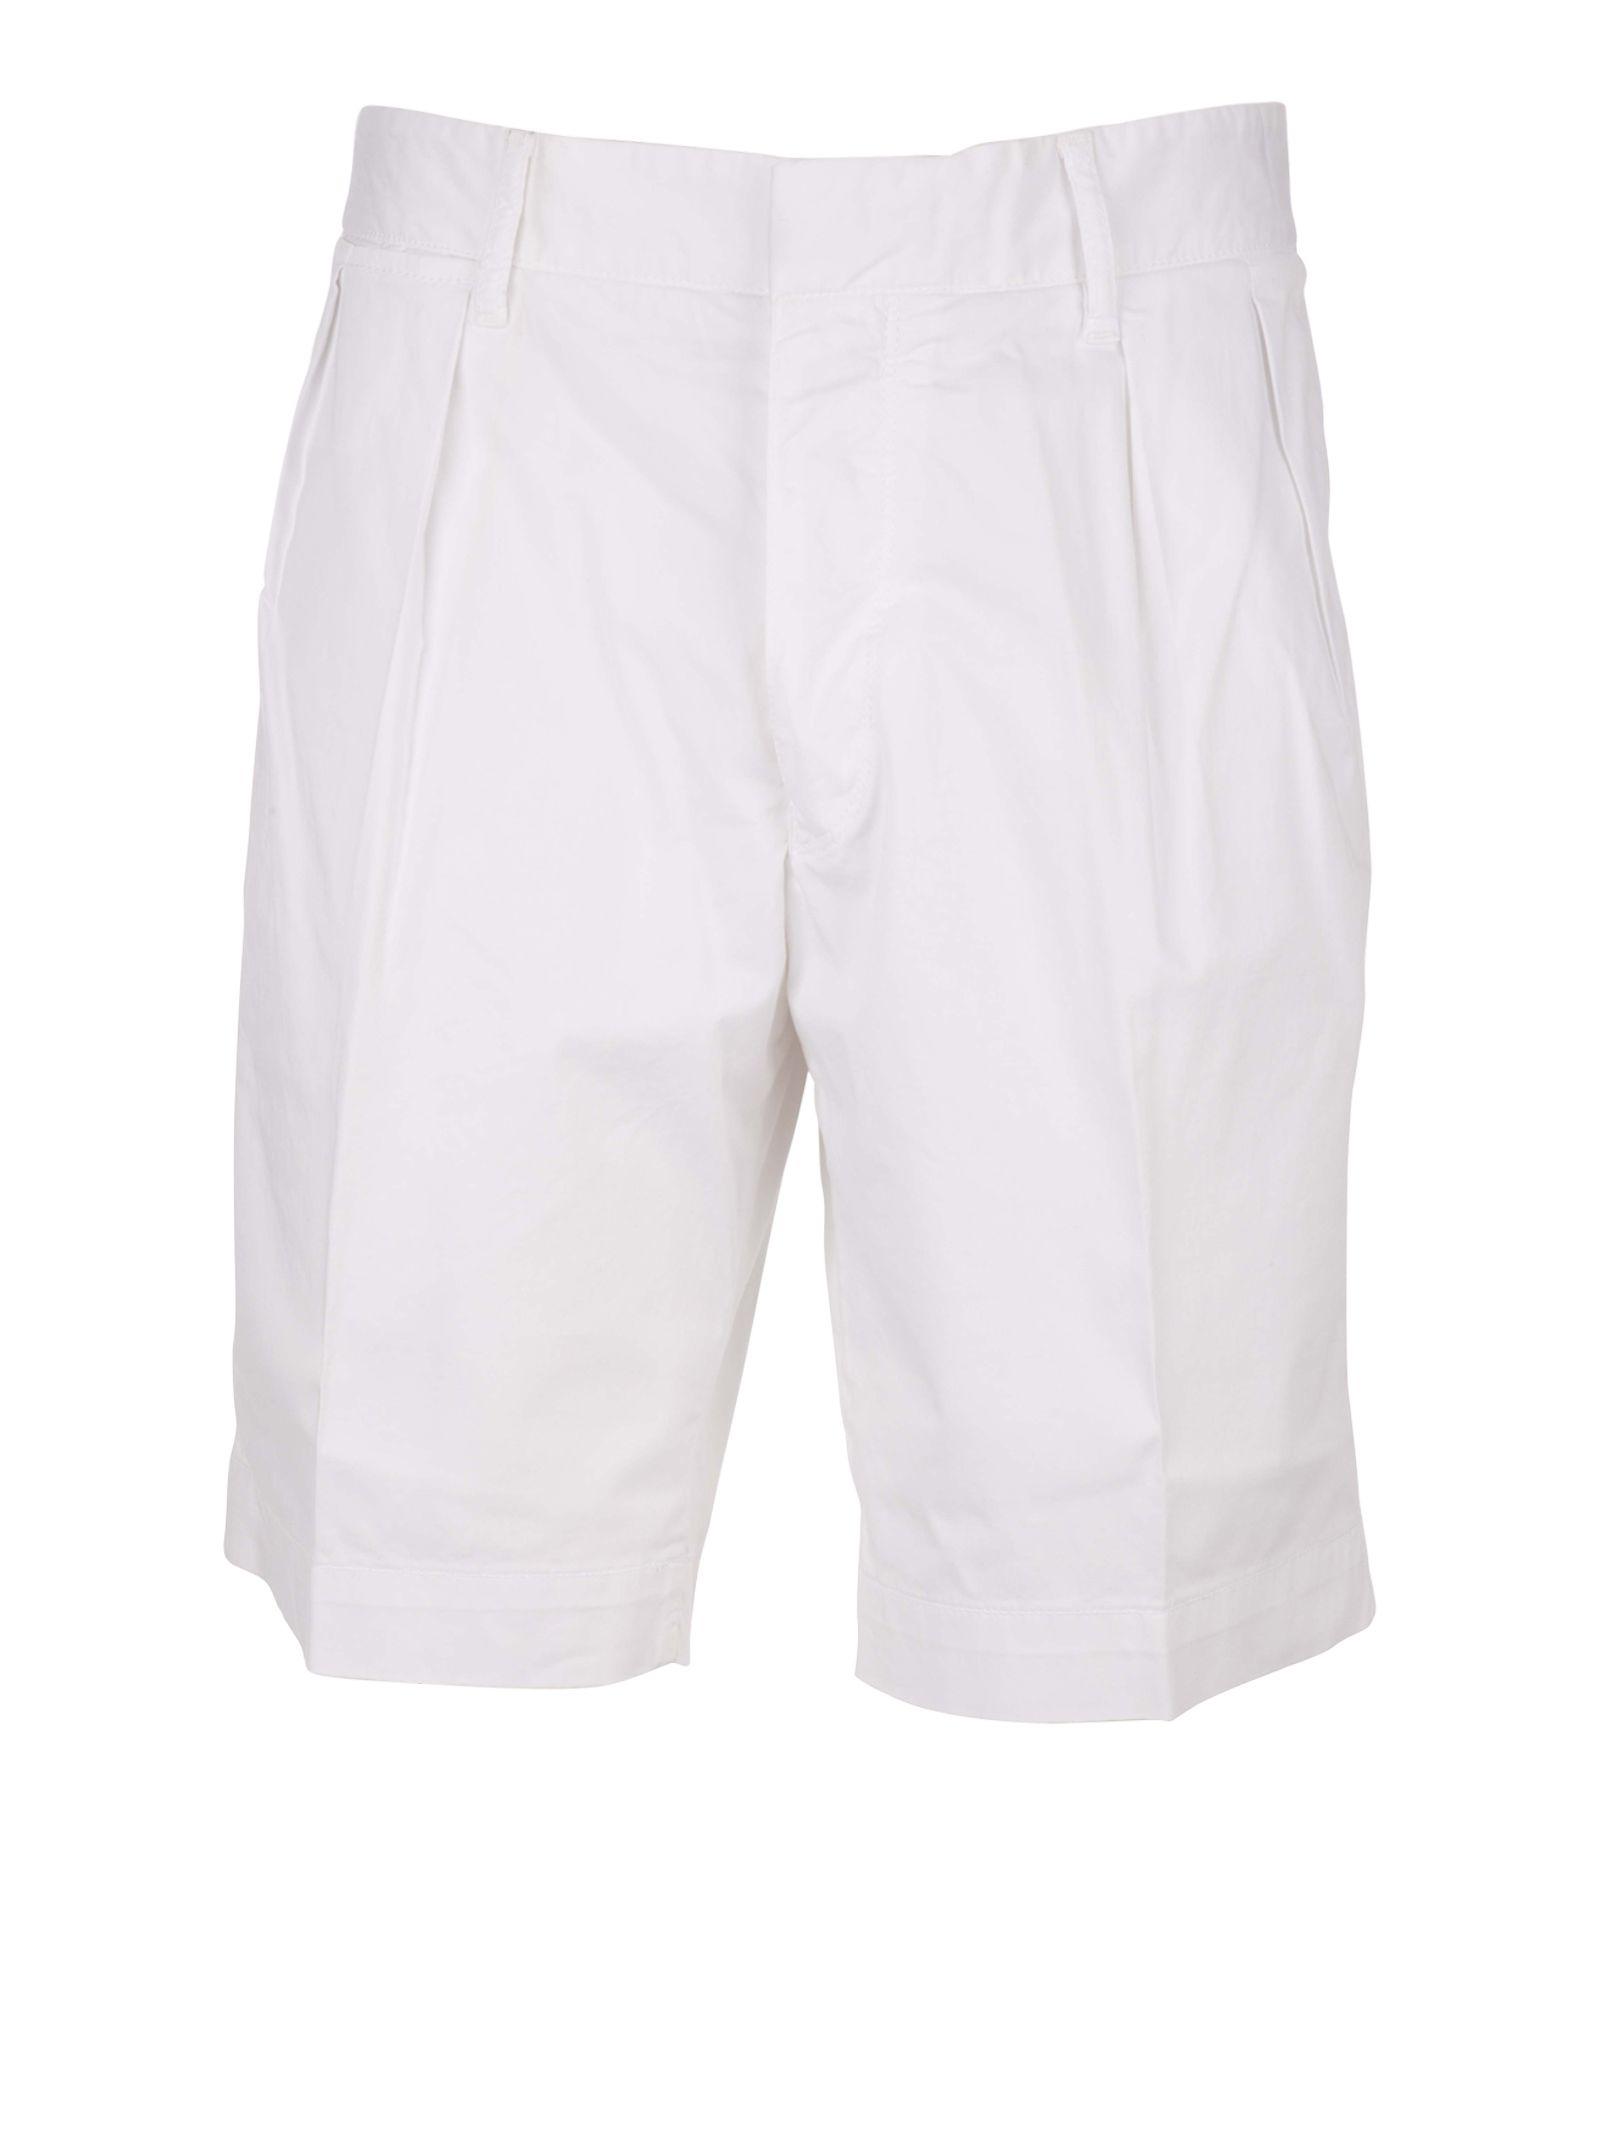 The Gigi Shorts